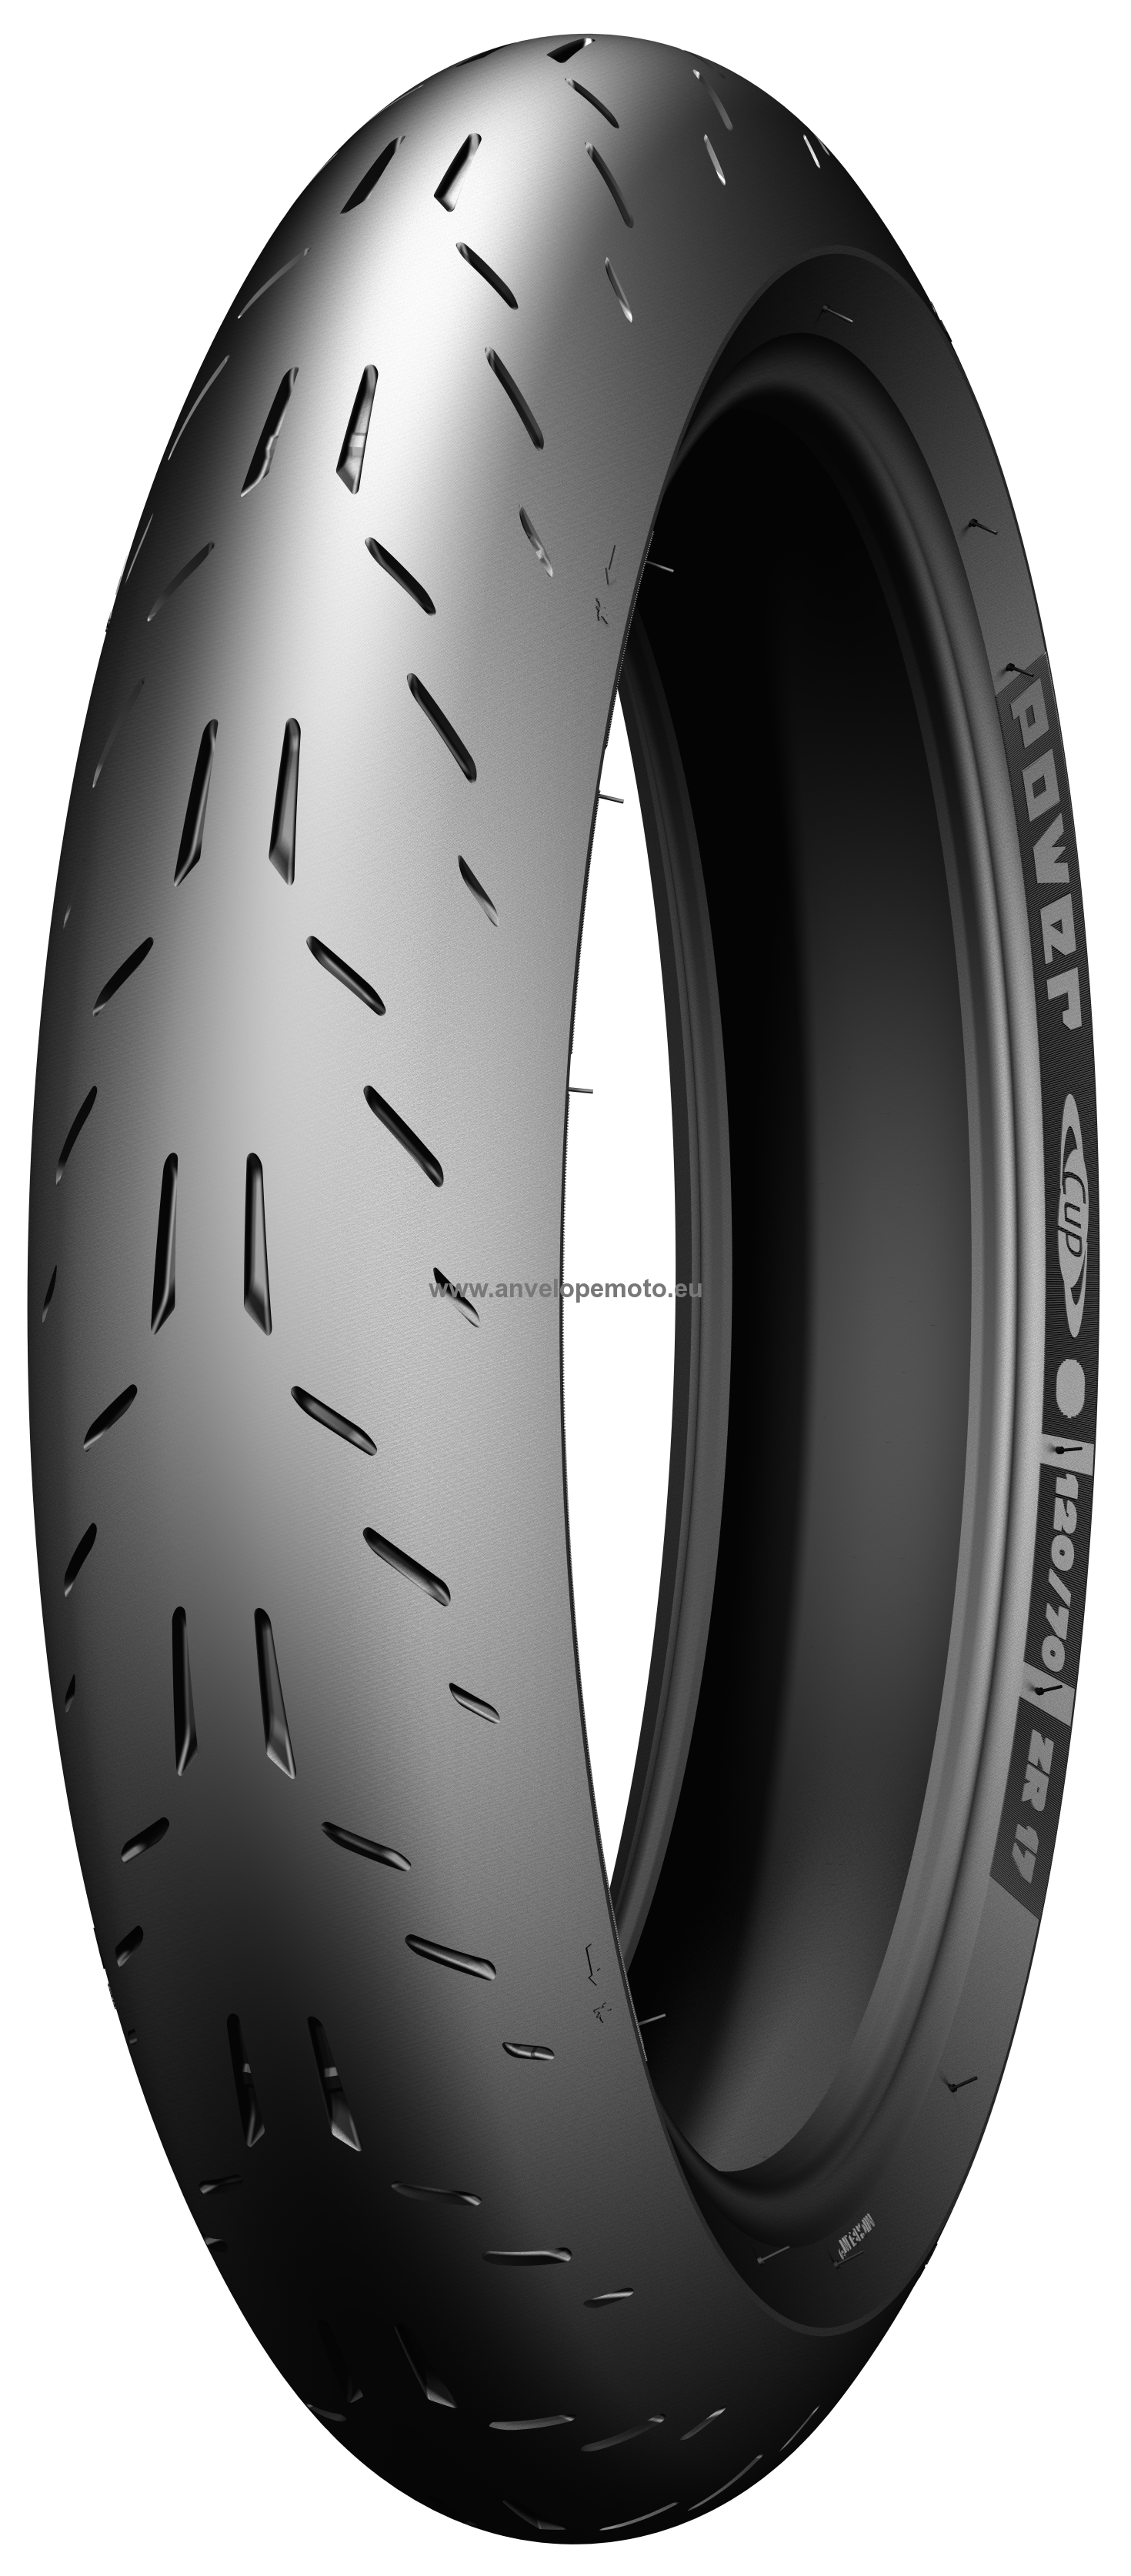 Michelin Power CUP EVO 120/70ZR17 58(W) Front TL